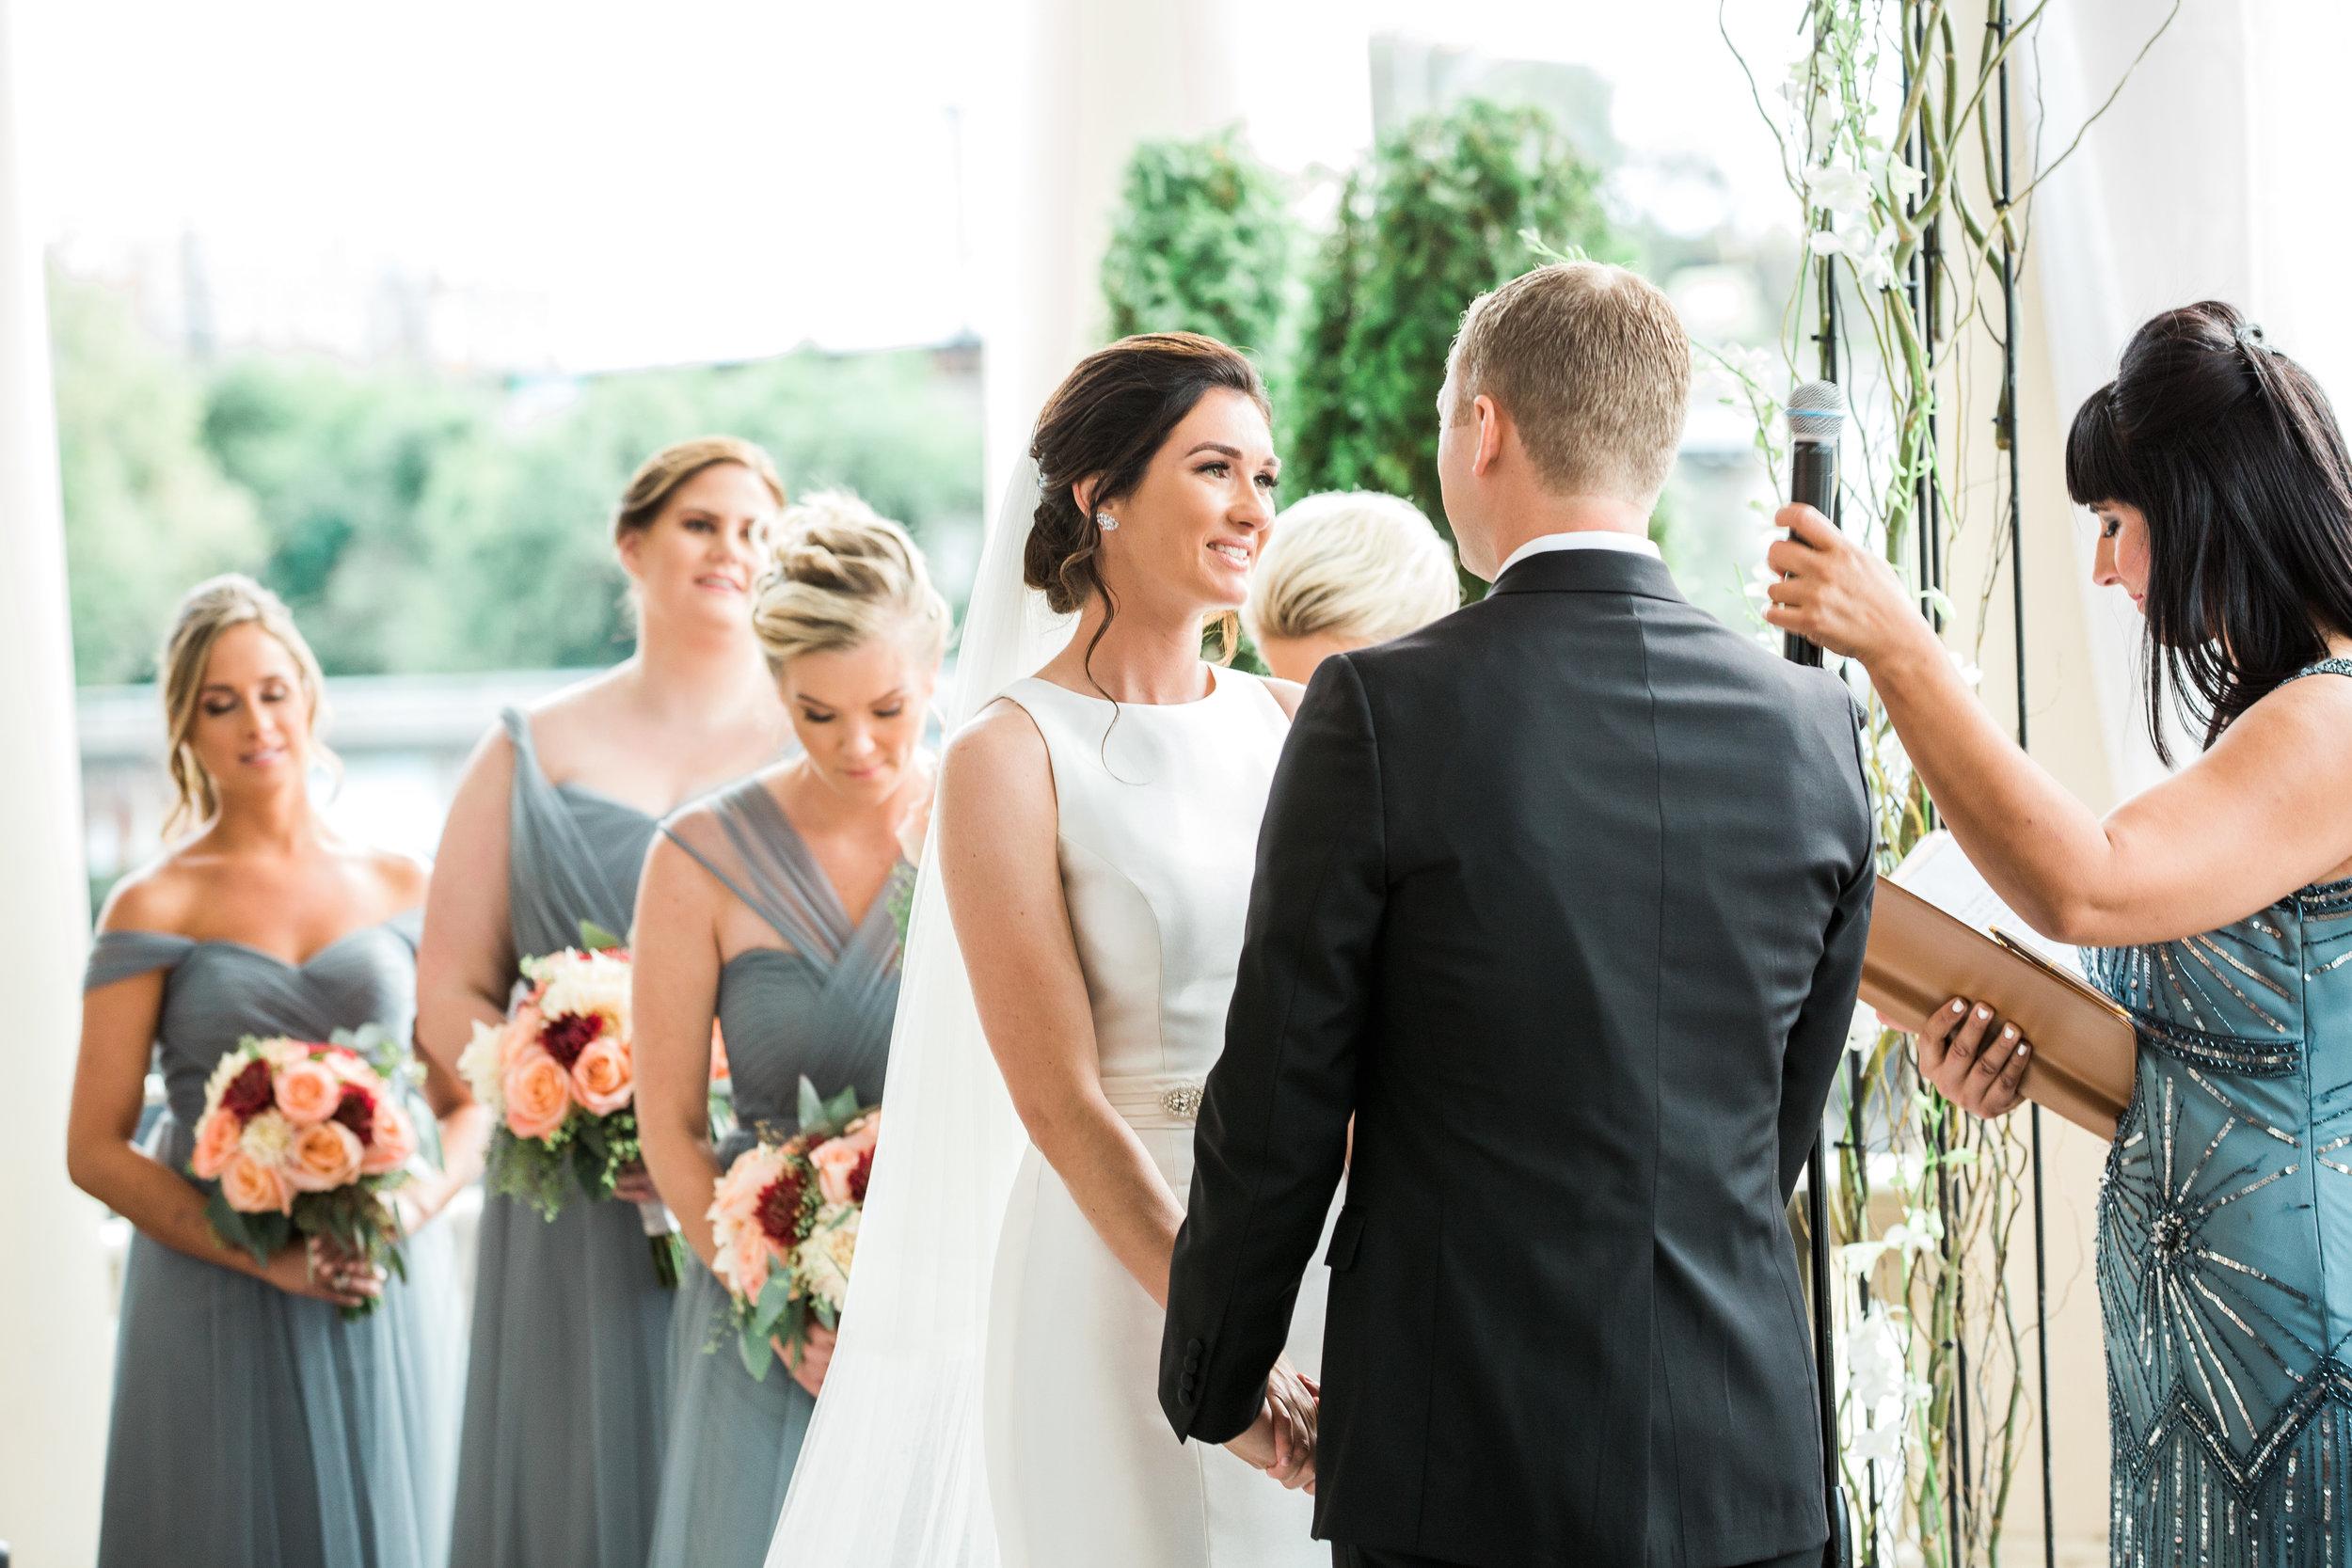 Hudson-Nichols-Black-Tie-Bride-Philadelphia-Waterworks-Wedding-Cescaphe-Ceremony19.jpg